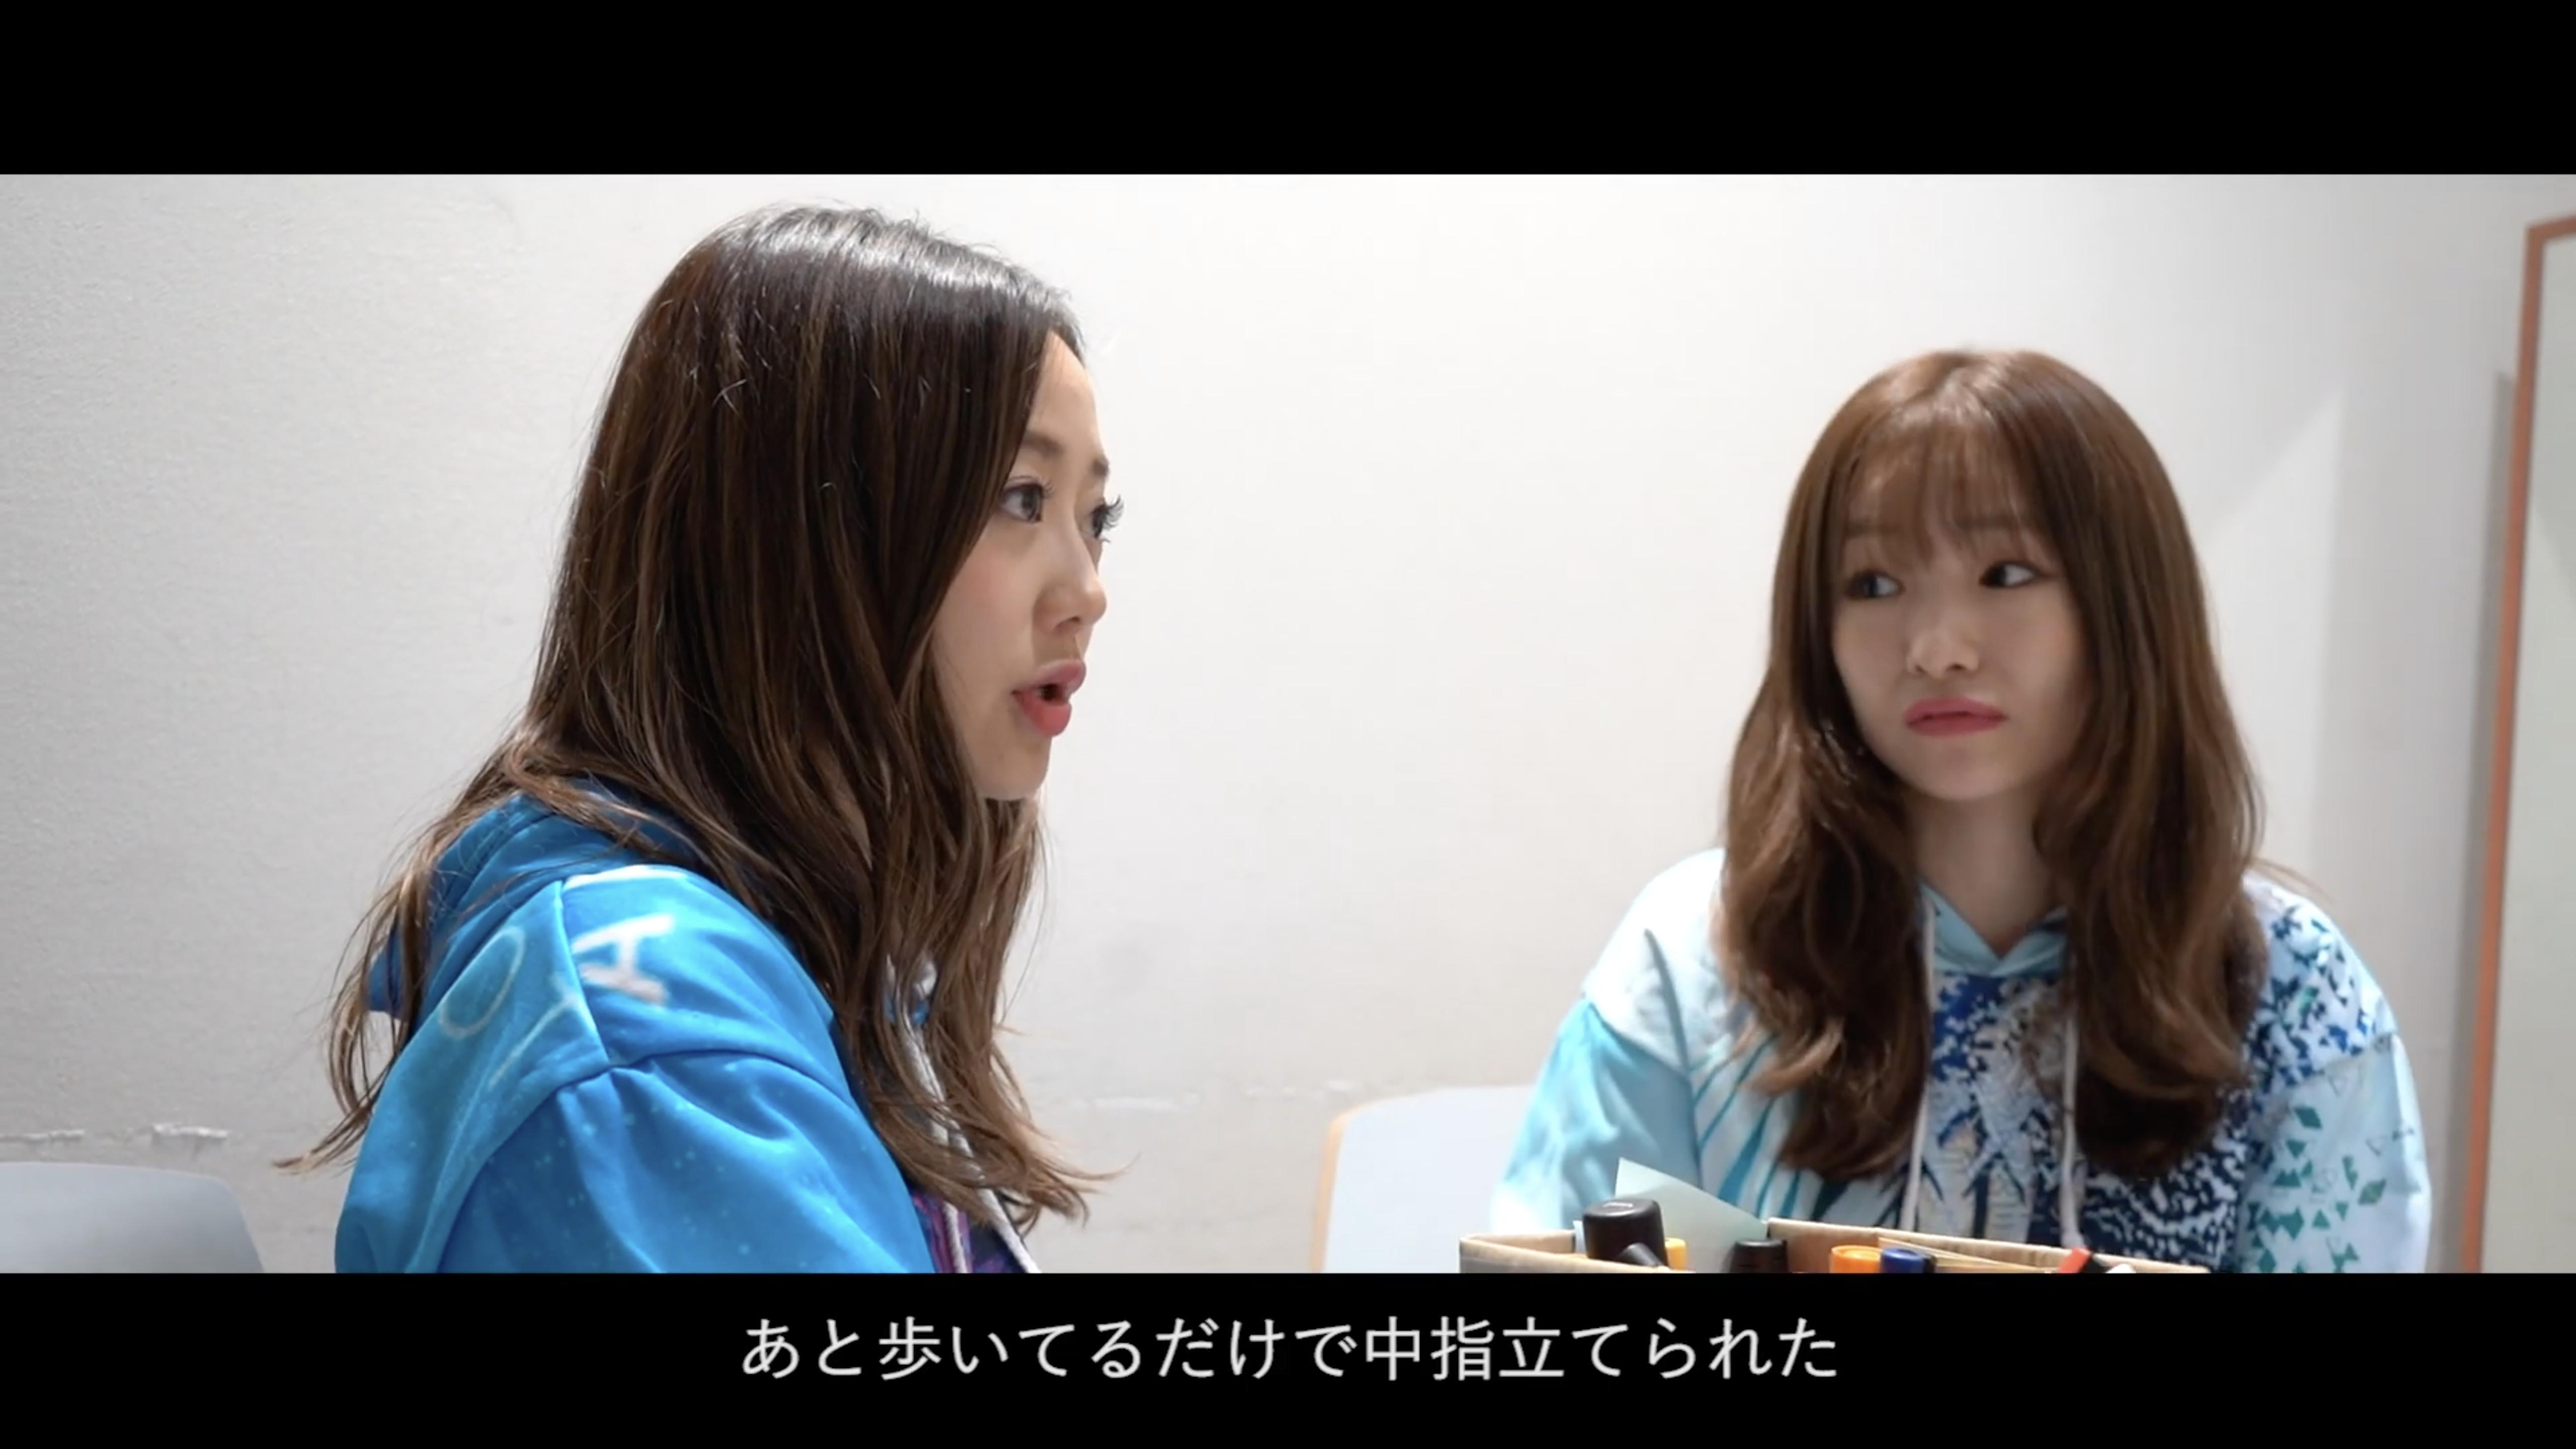 hy4_4yh(ハイパーヨーヨ)ドキュメンタリー第5話 画像05